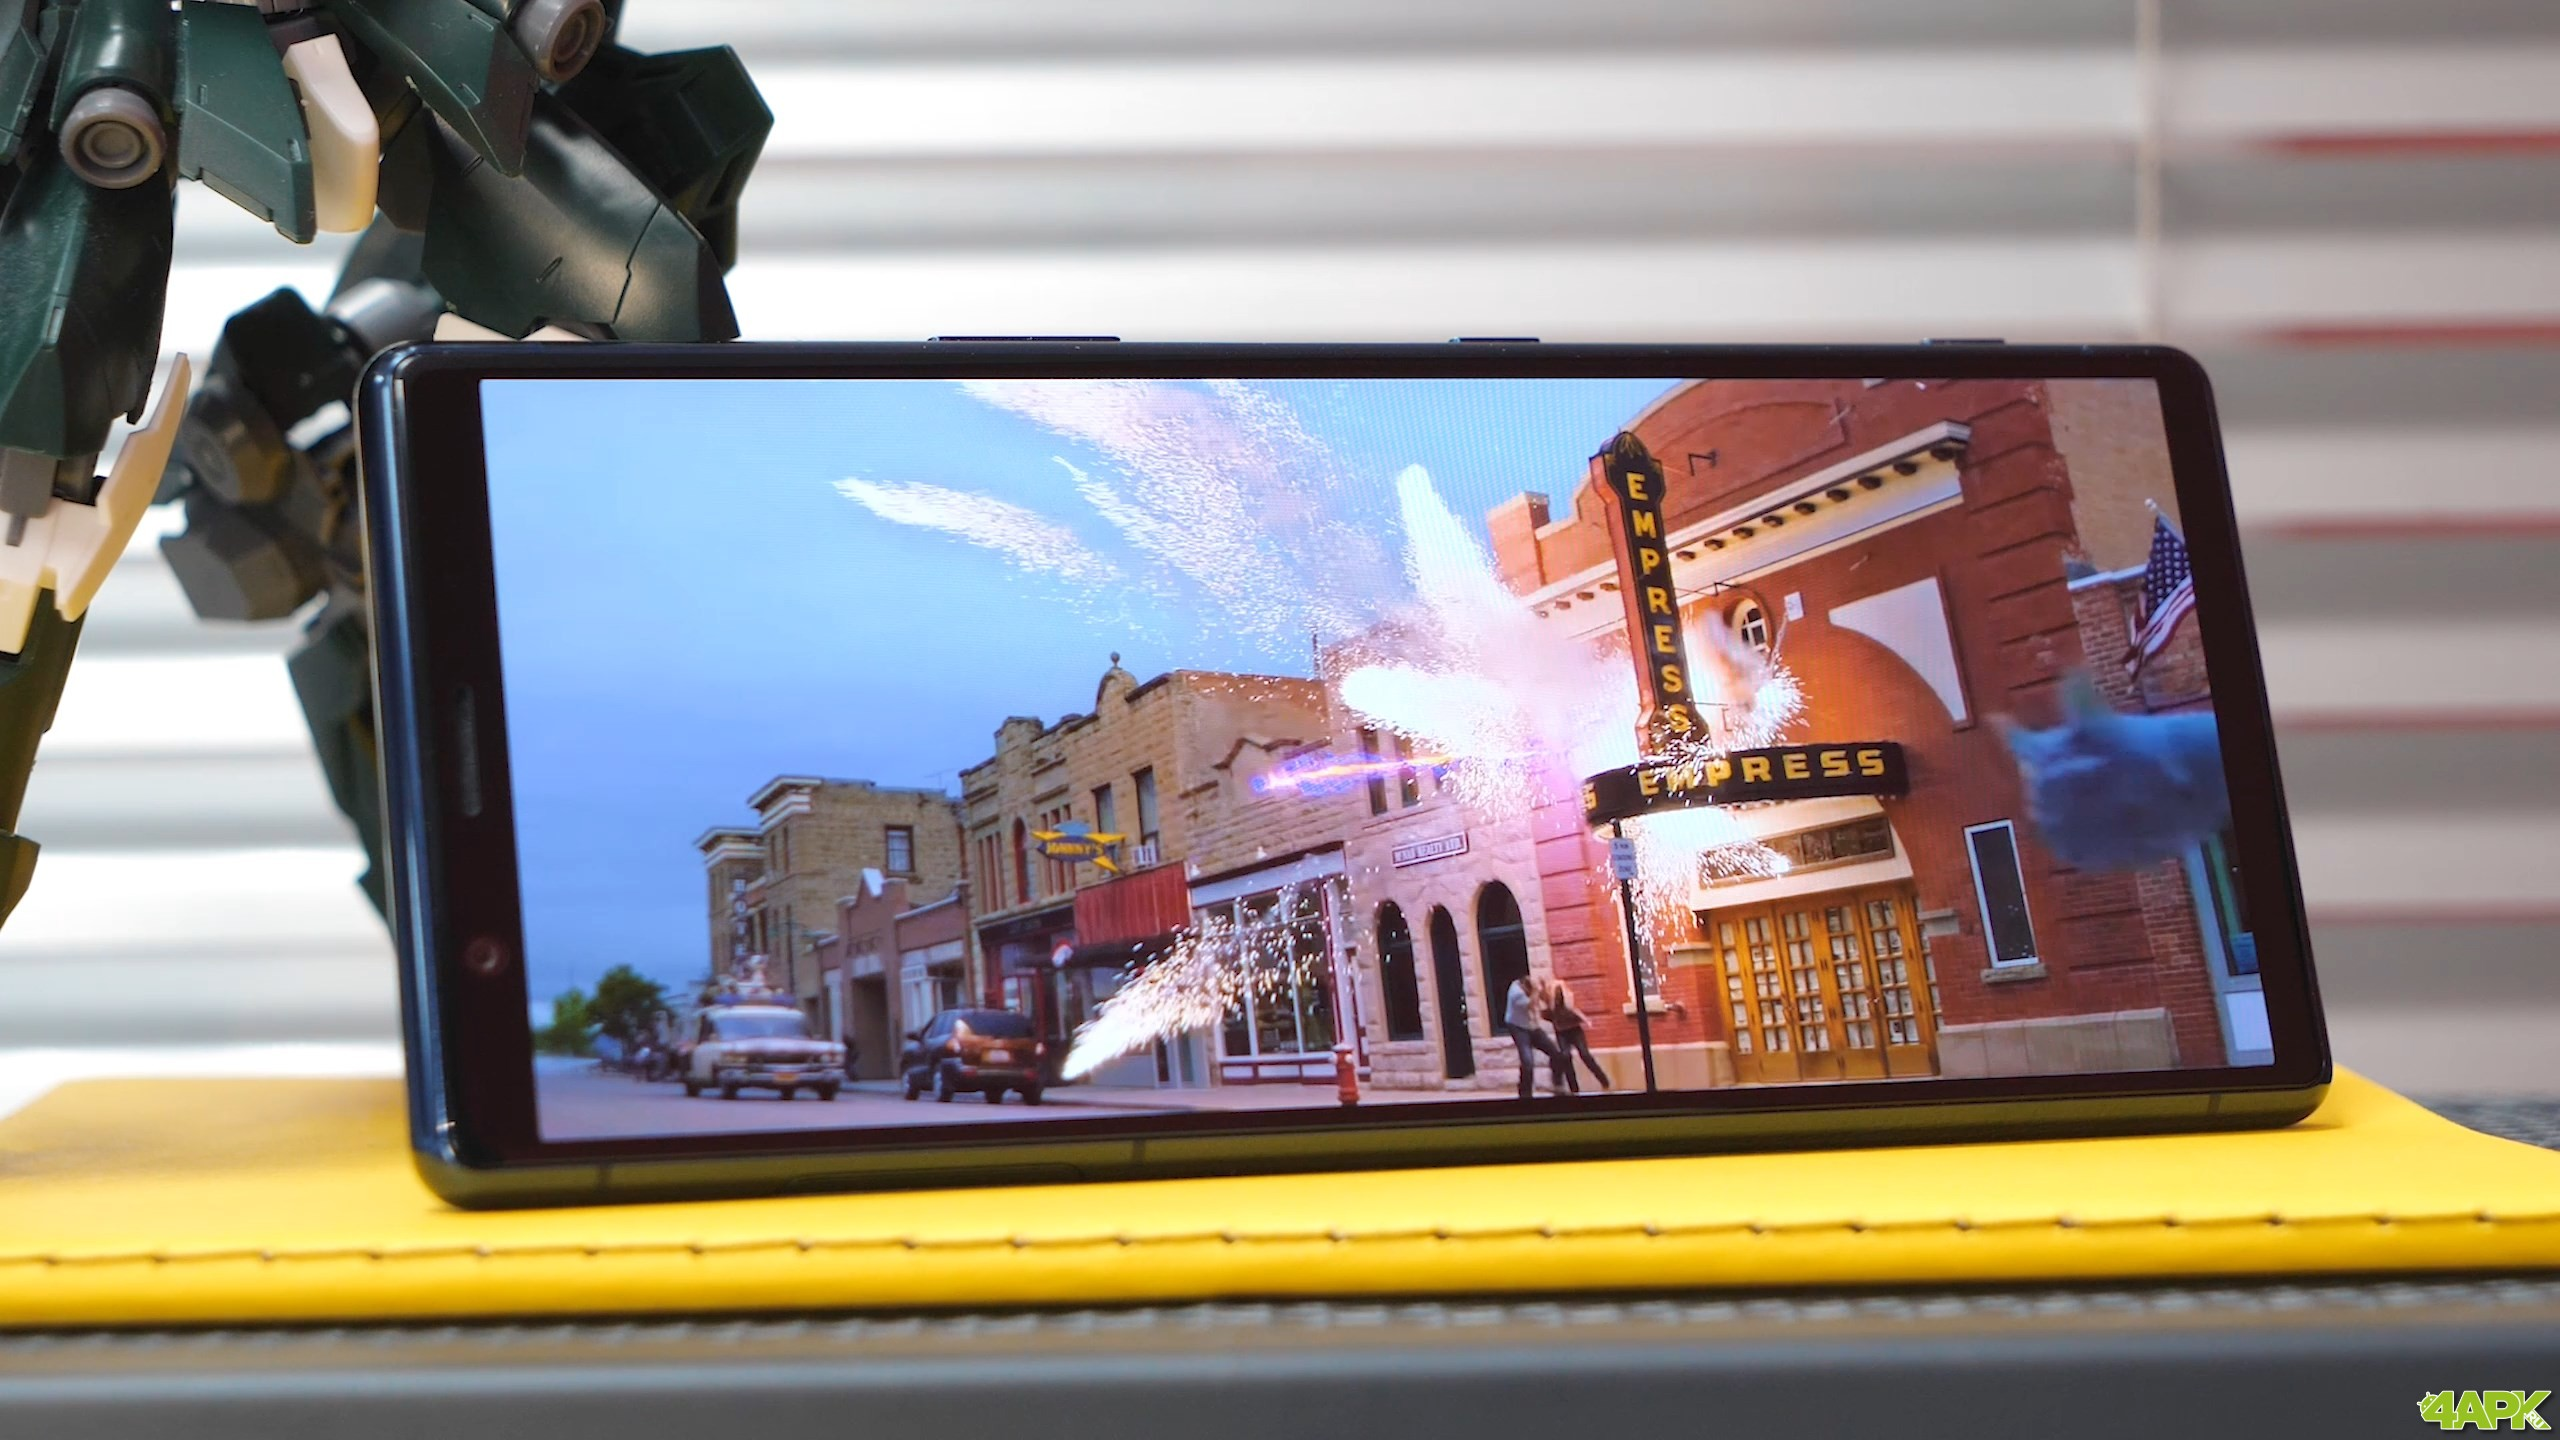 Обзор Sony Xperia 5: компактный смартфон с большим экраном Другие устройства  - obzor_sony_xperia_5_kompakt_s_bolshim_ekranom_picture41_1